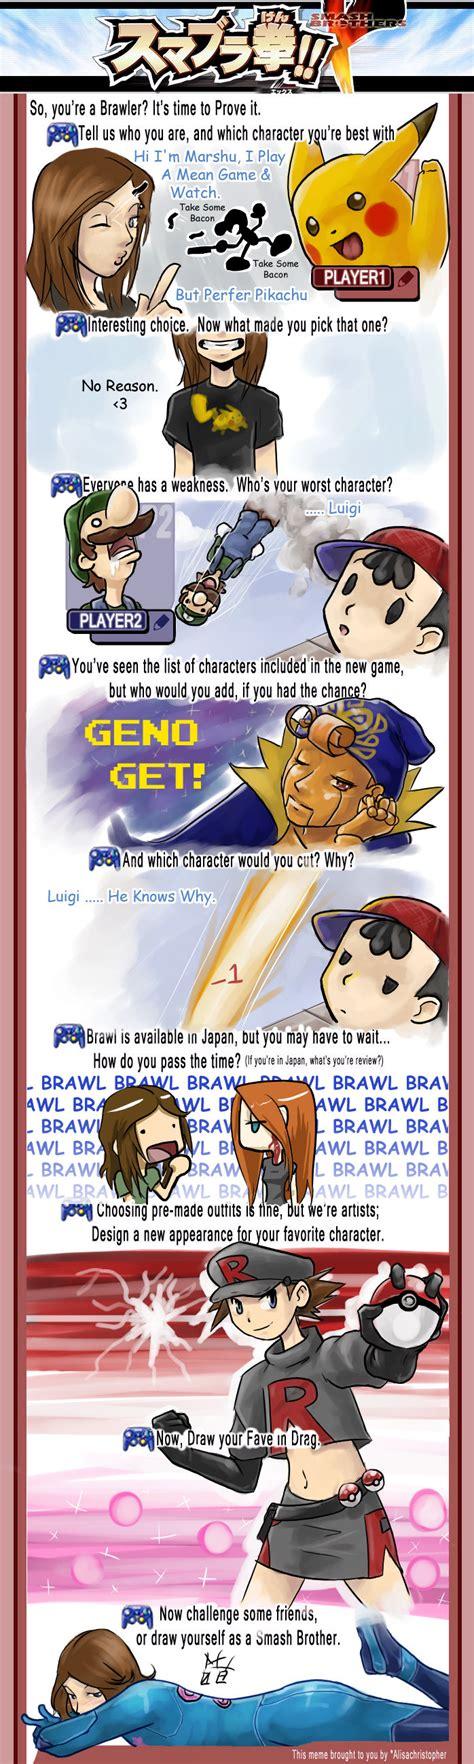 Super Smash Bros Memes - super smash bros brawl meme www imgkid com the image kid has it